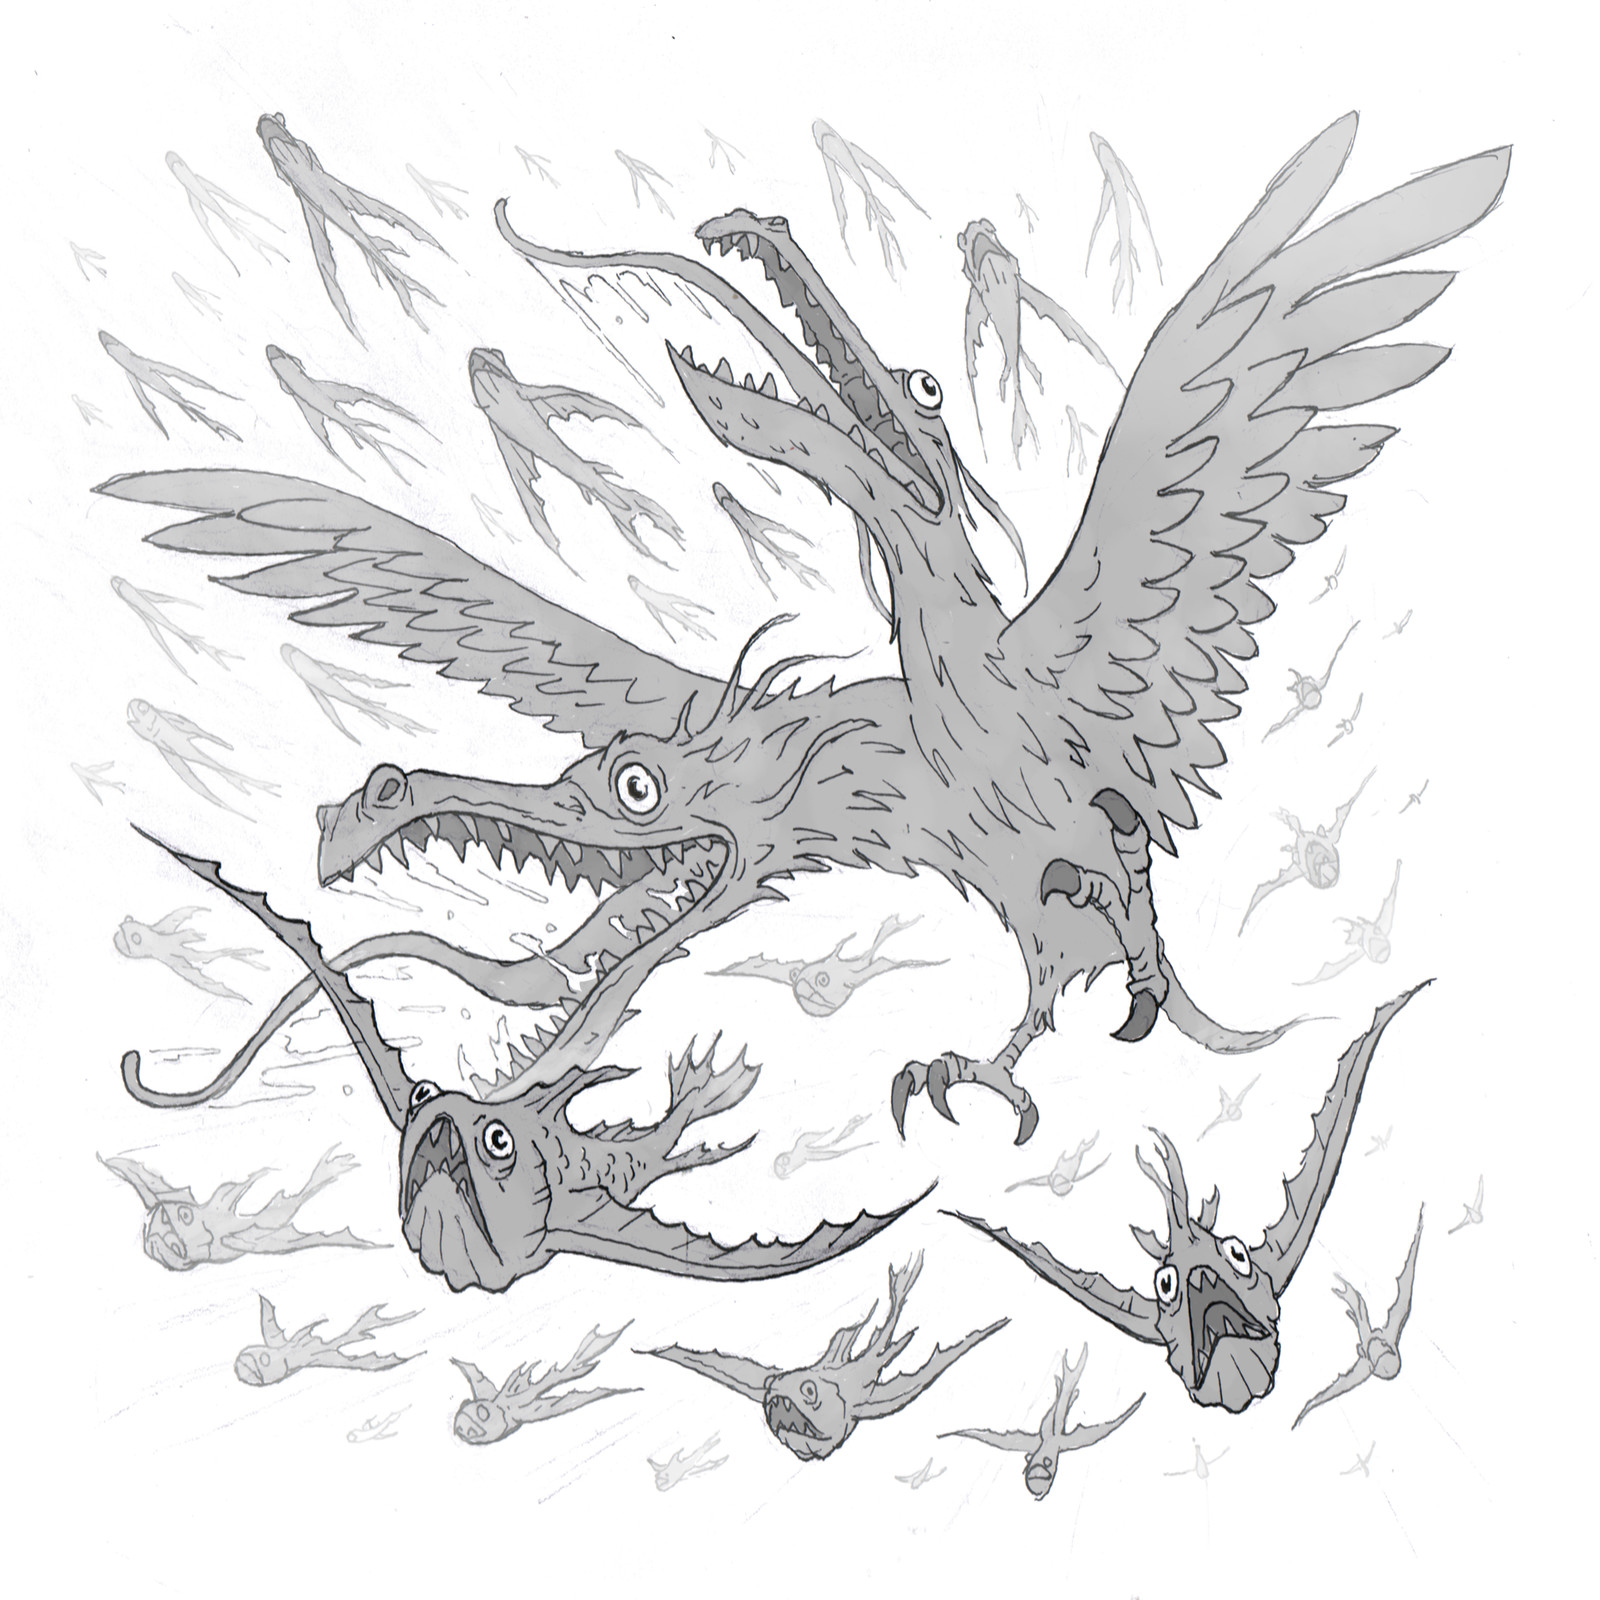 Dinobirds!